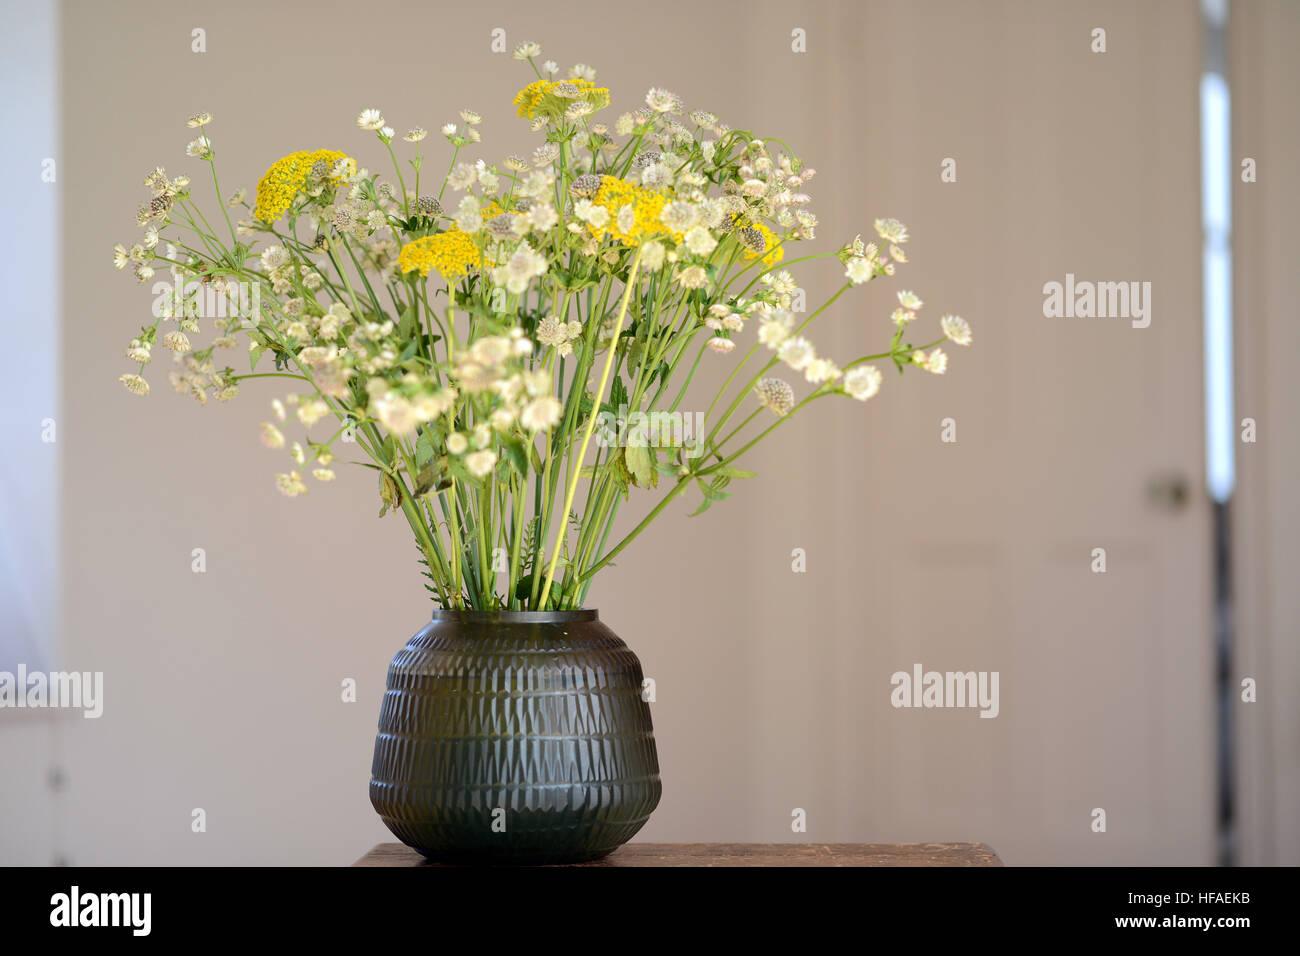 Smokey glass vase with flower display inside - Stock Image